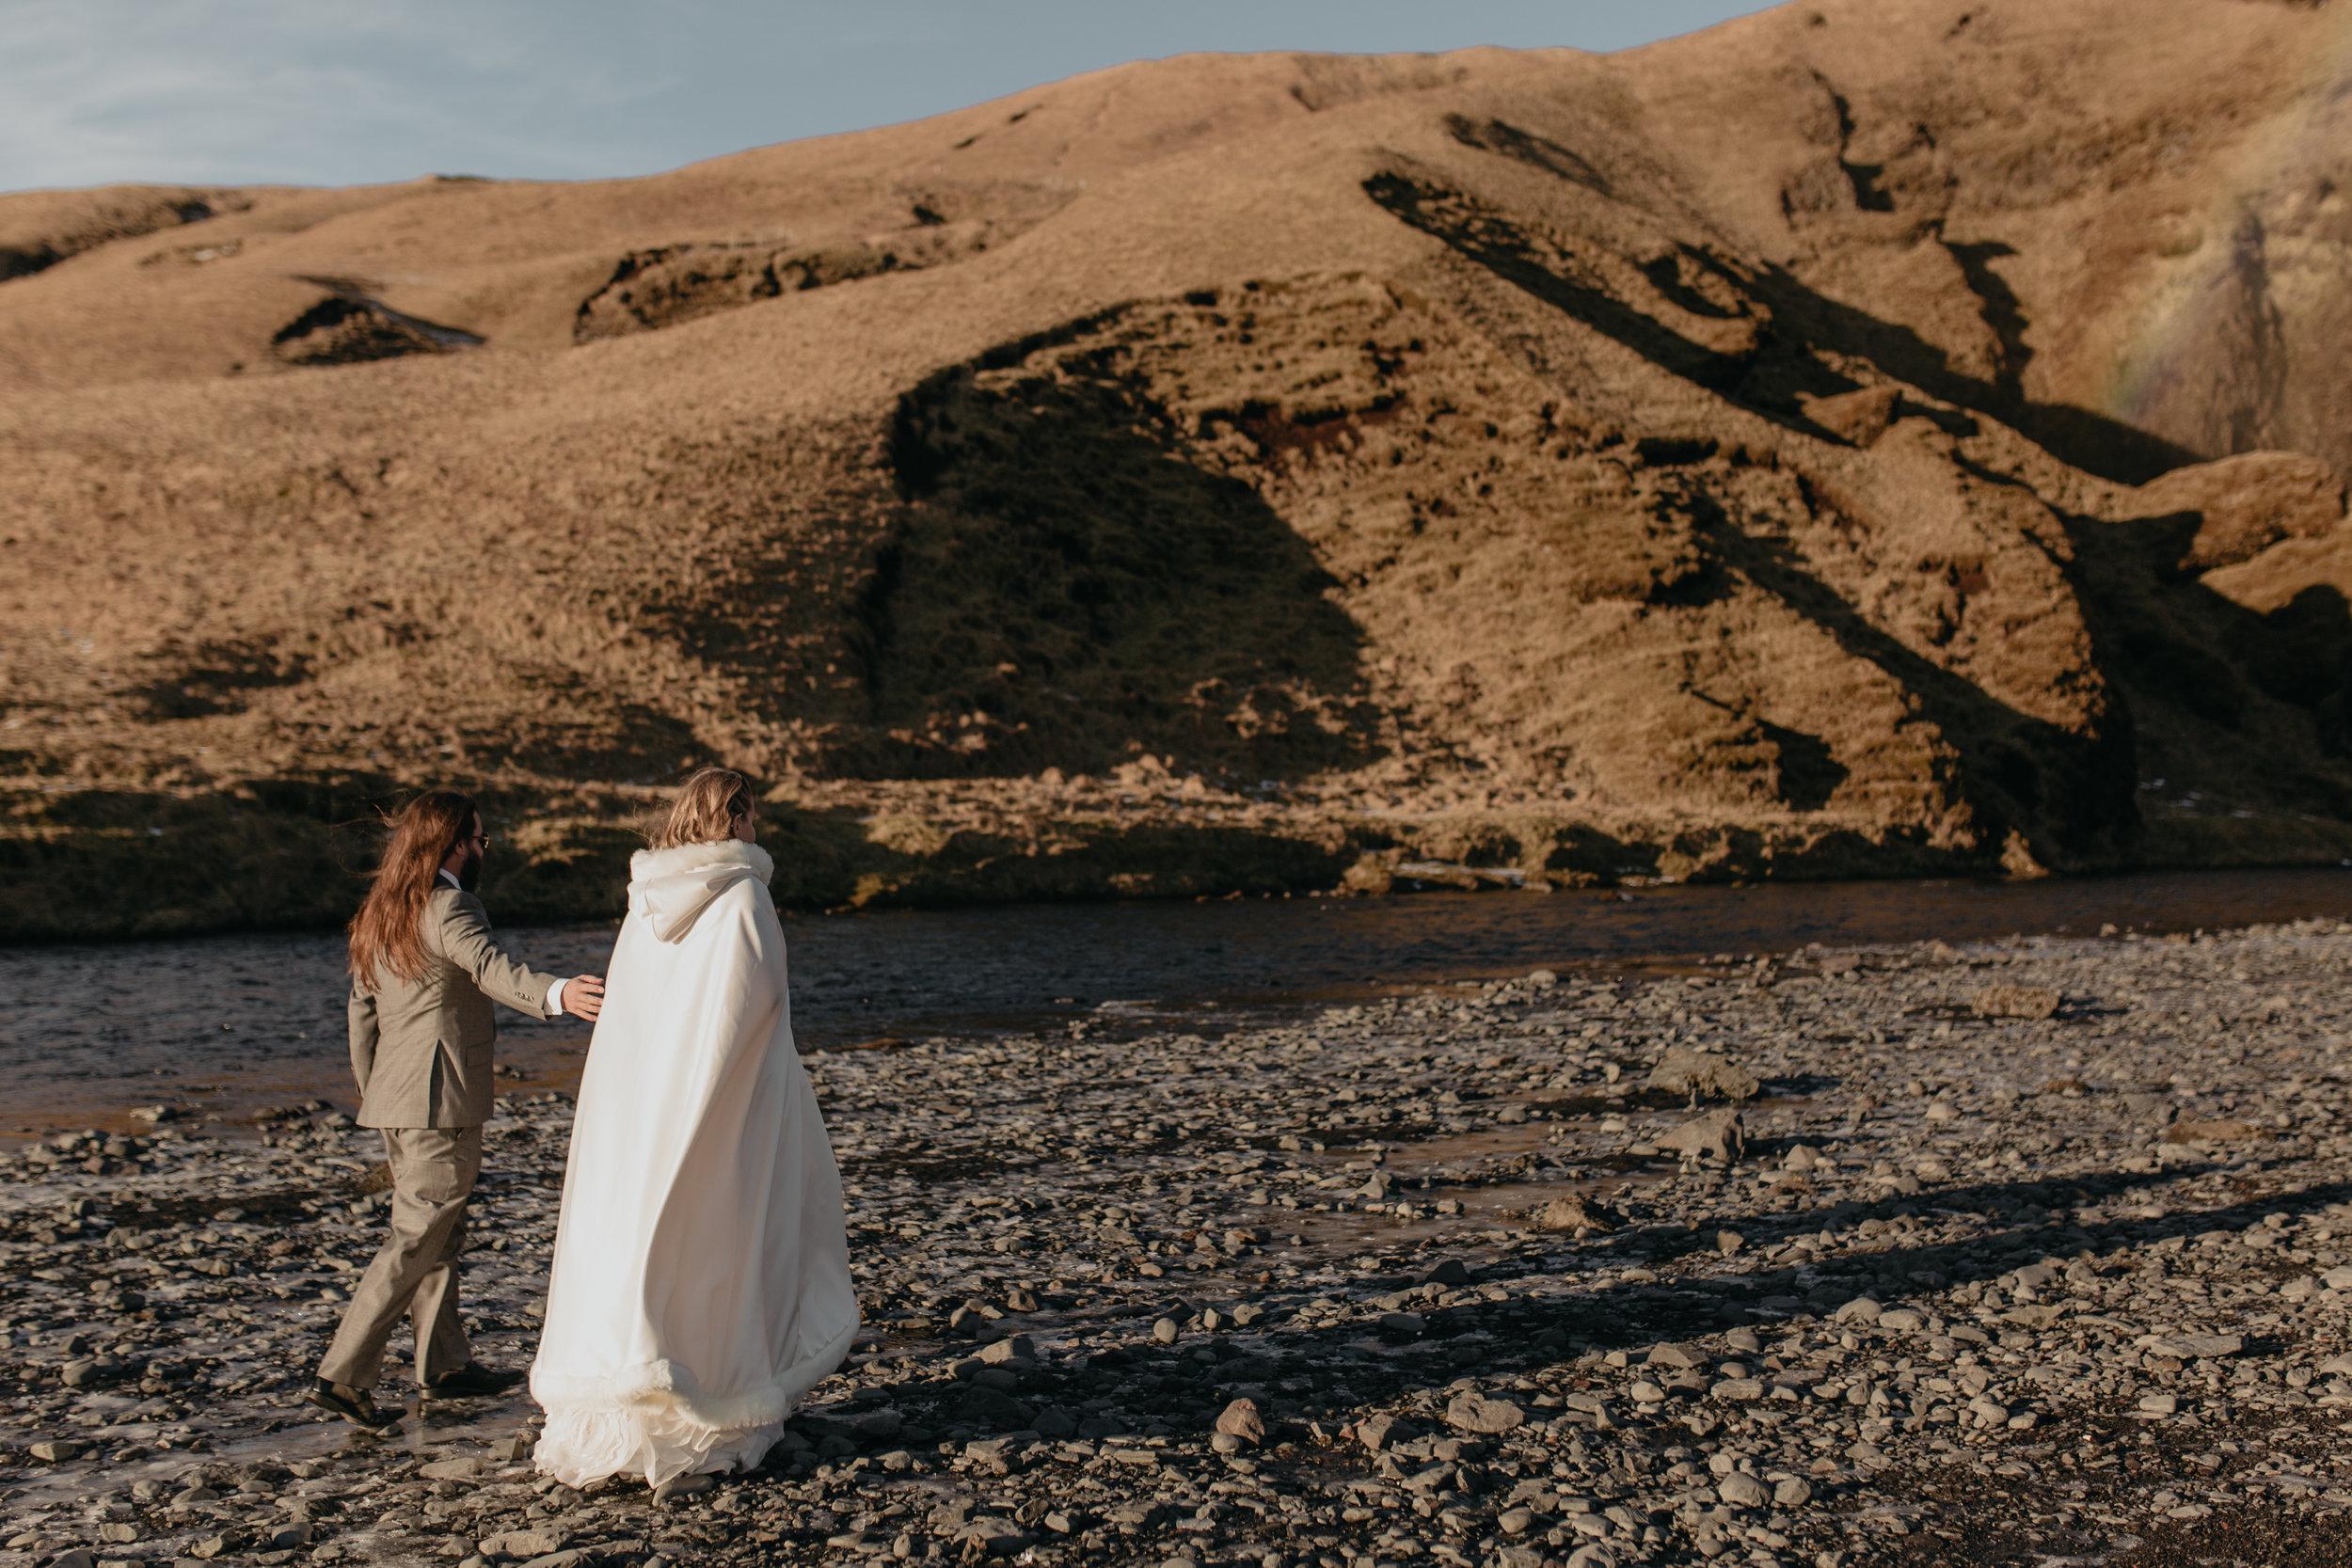 nicole-daacke-photography-iceland-winter-sunset-adventure-elopement-skogafoss-waterfall-black-sand-beach-dyrholaey-vik-iceland-intimate-wedding-black-church-elopement-photographer-2.jpg